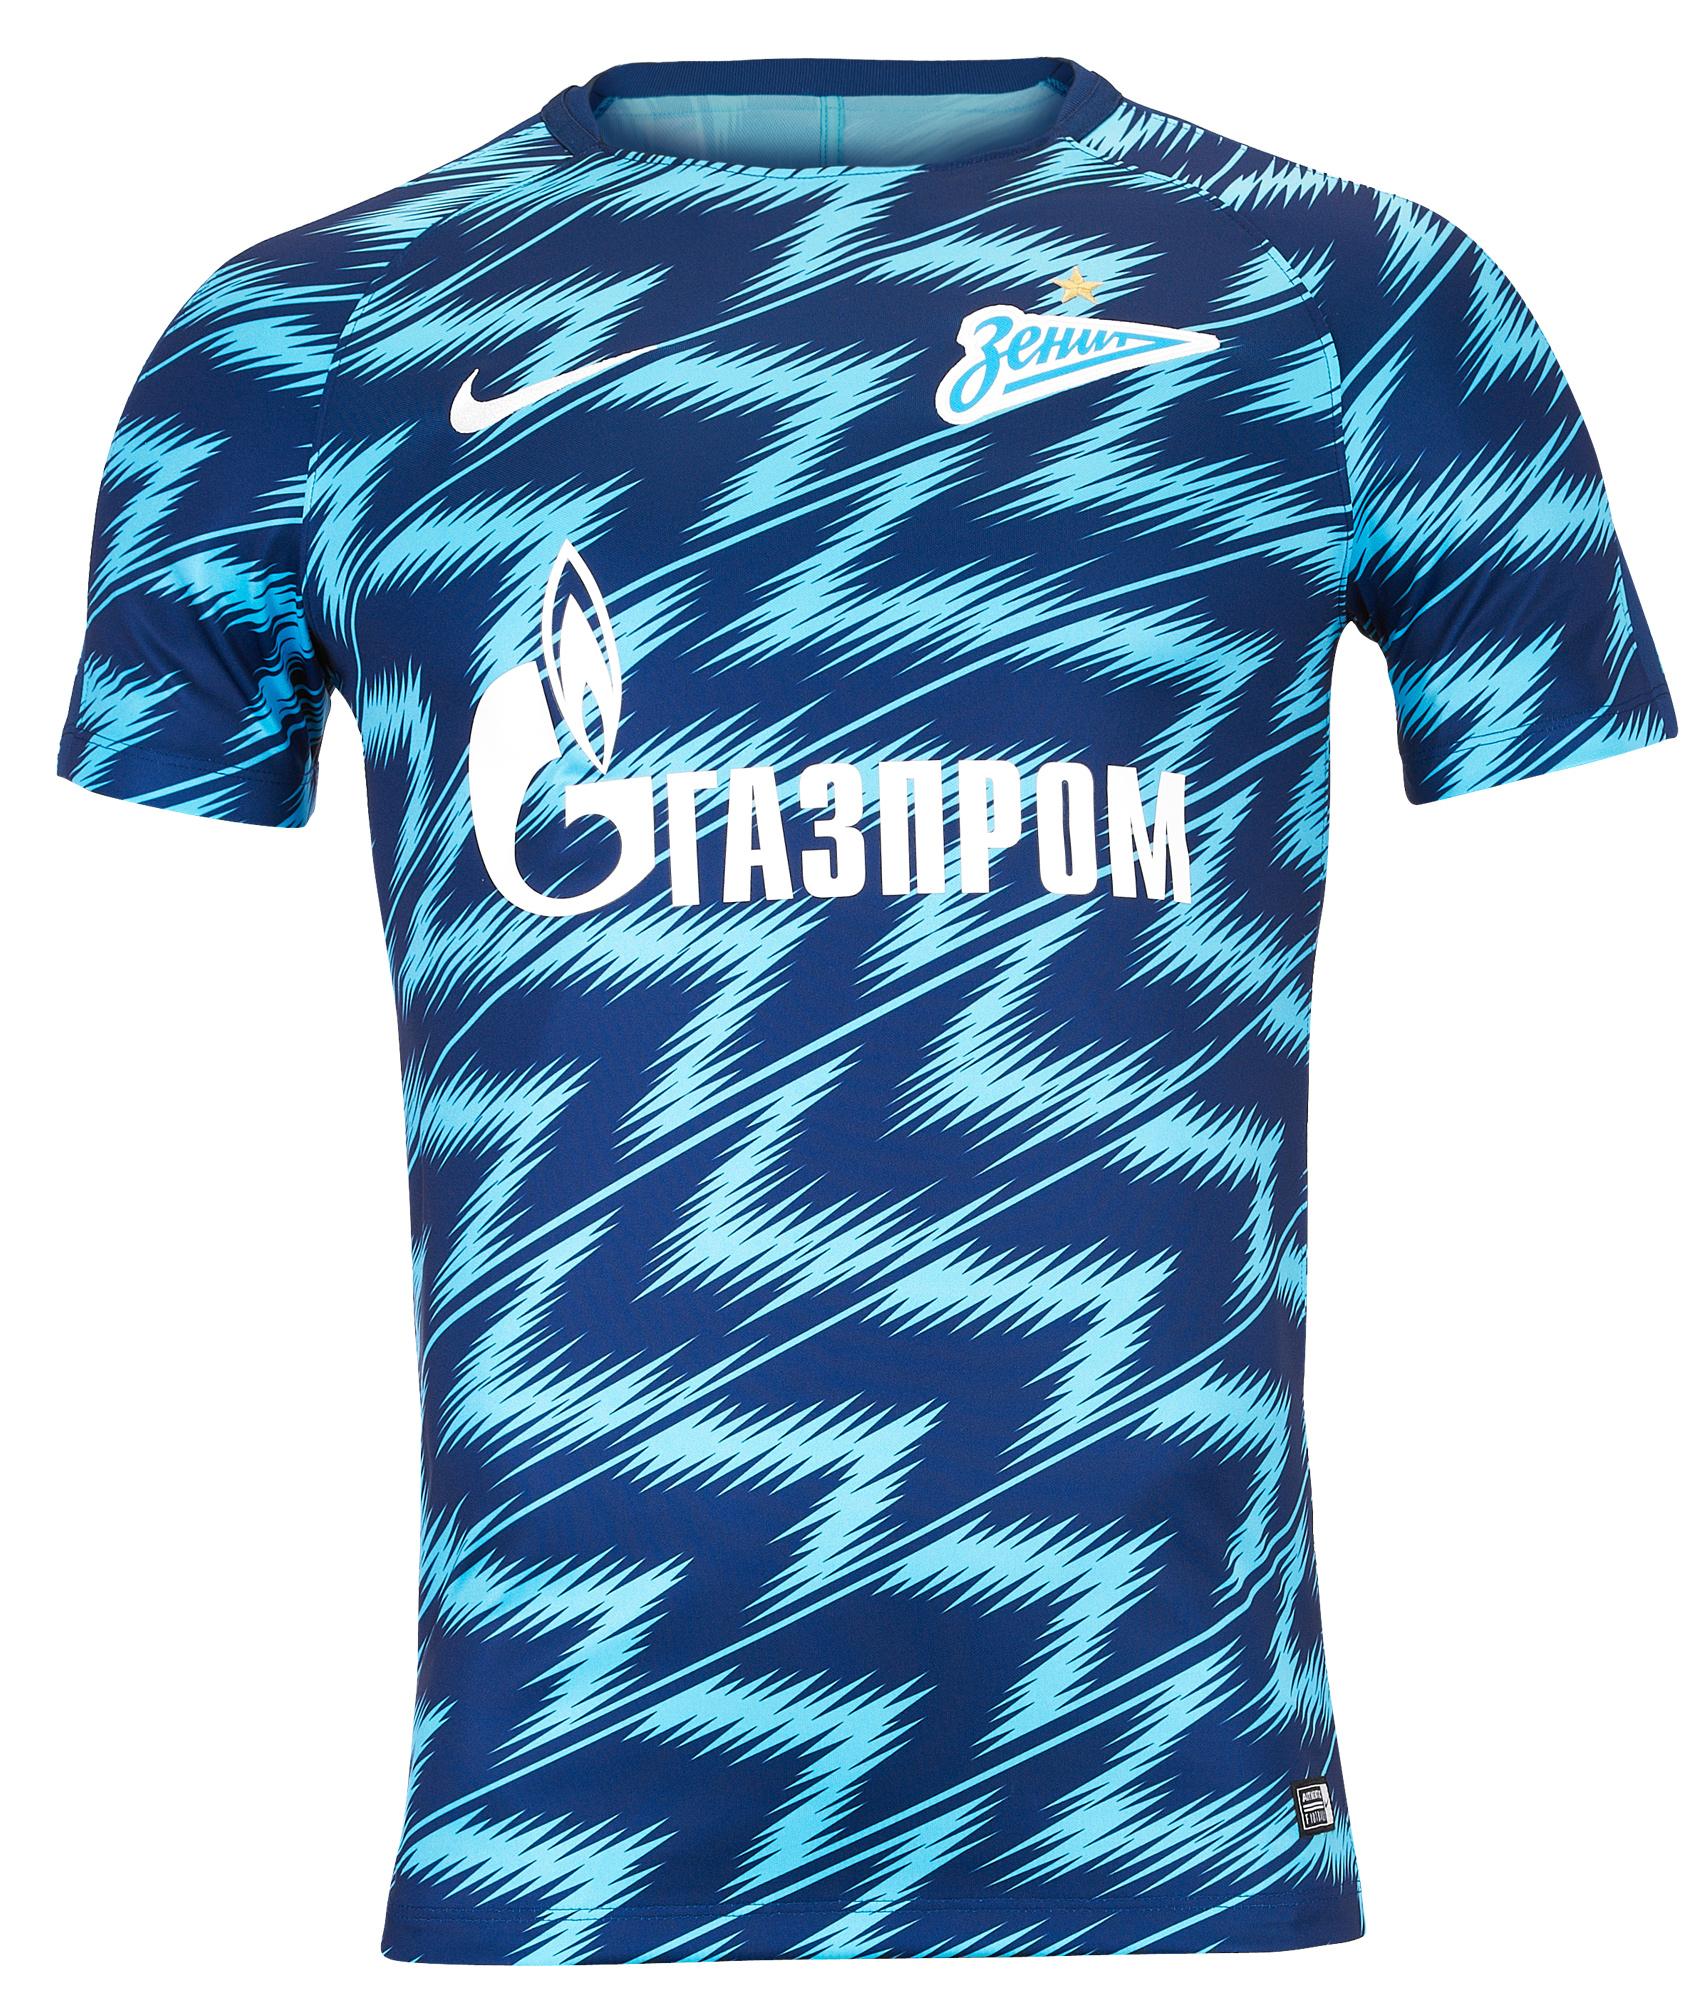 Предыгровая футболка Nike Zenit 2018/19